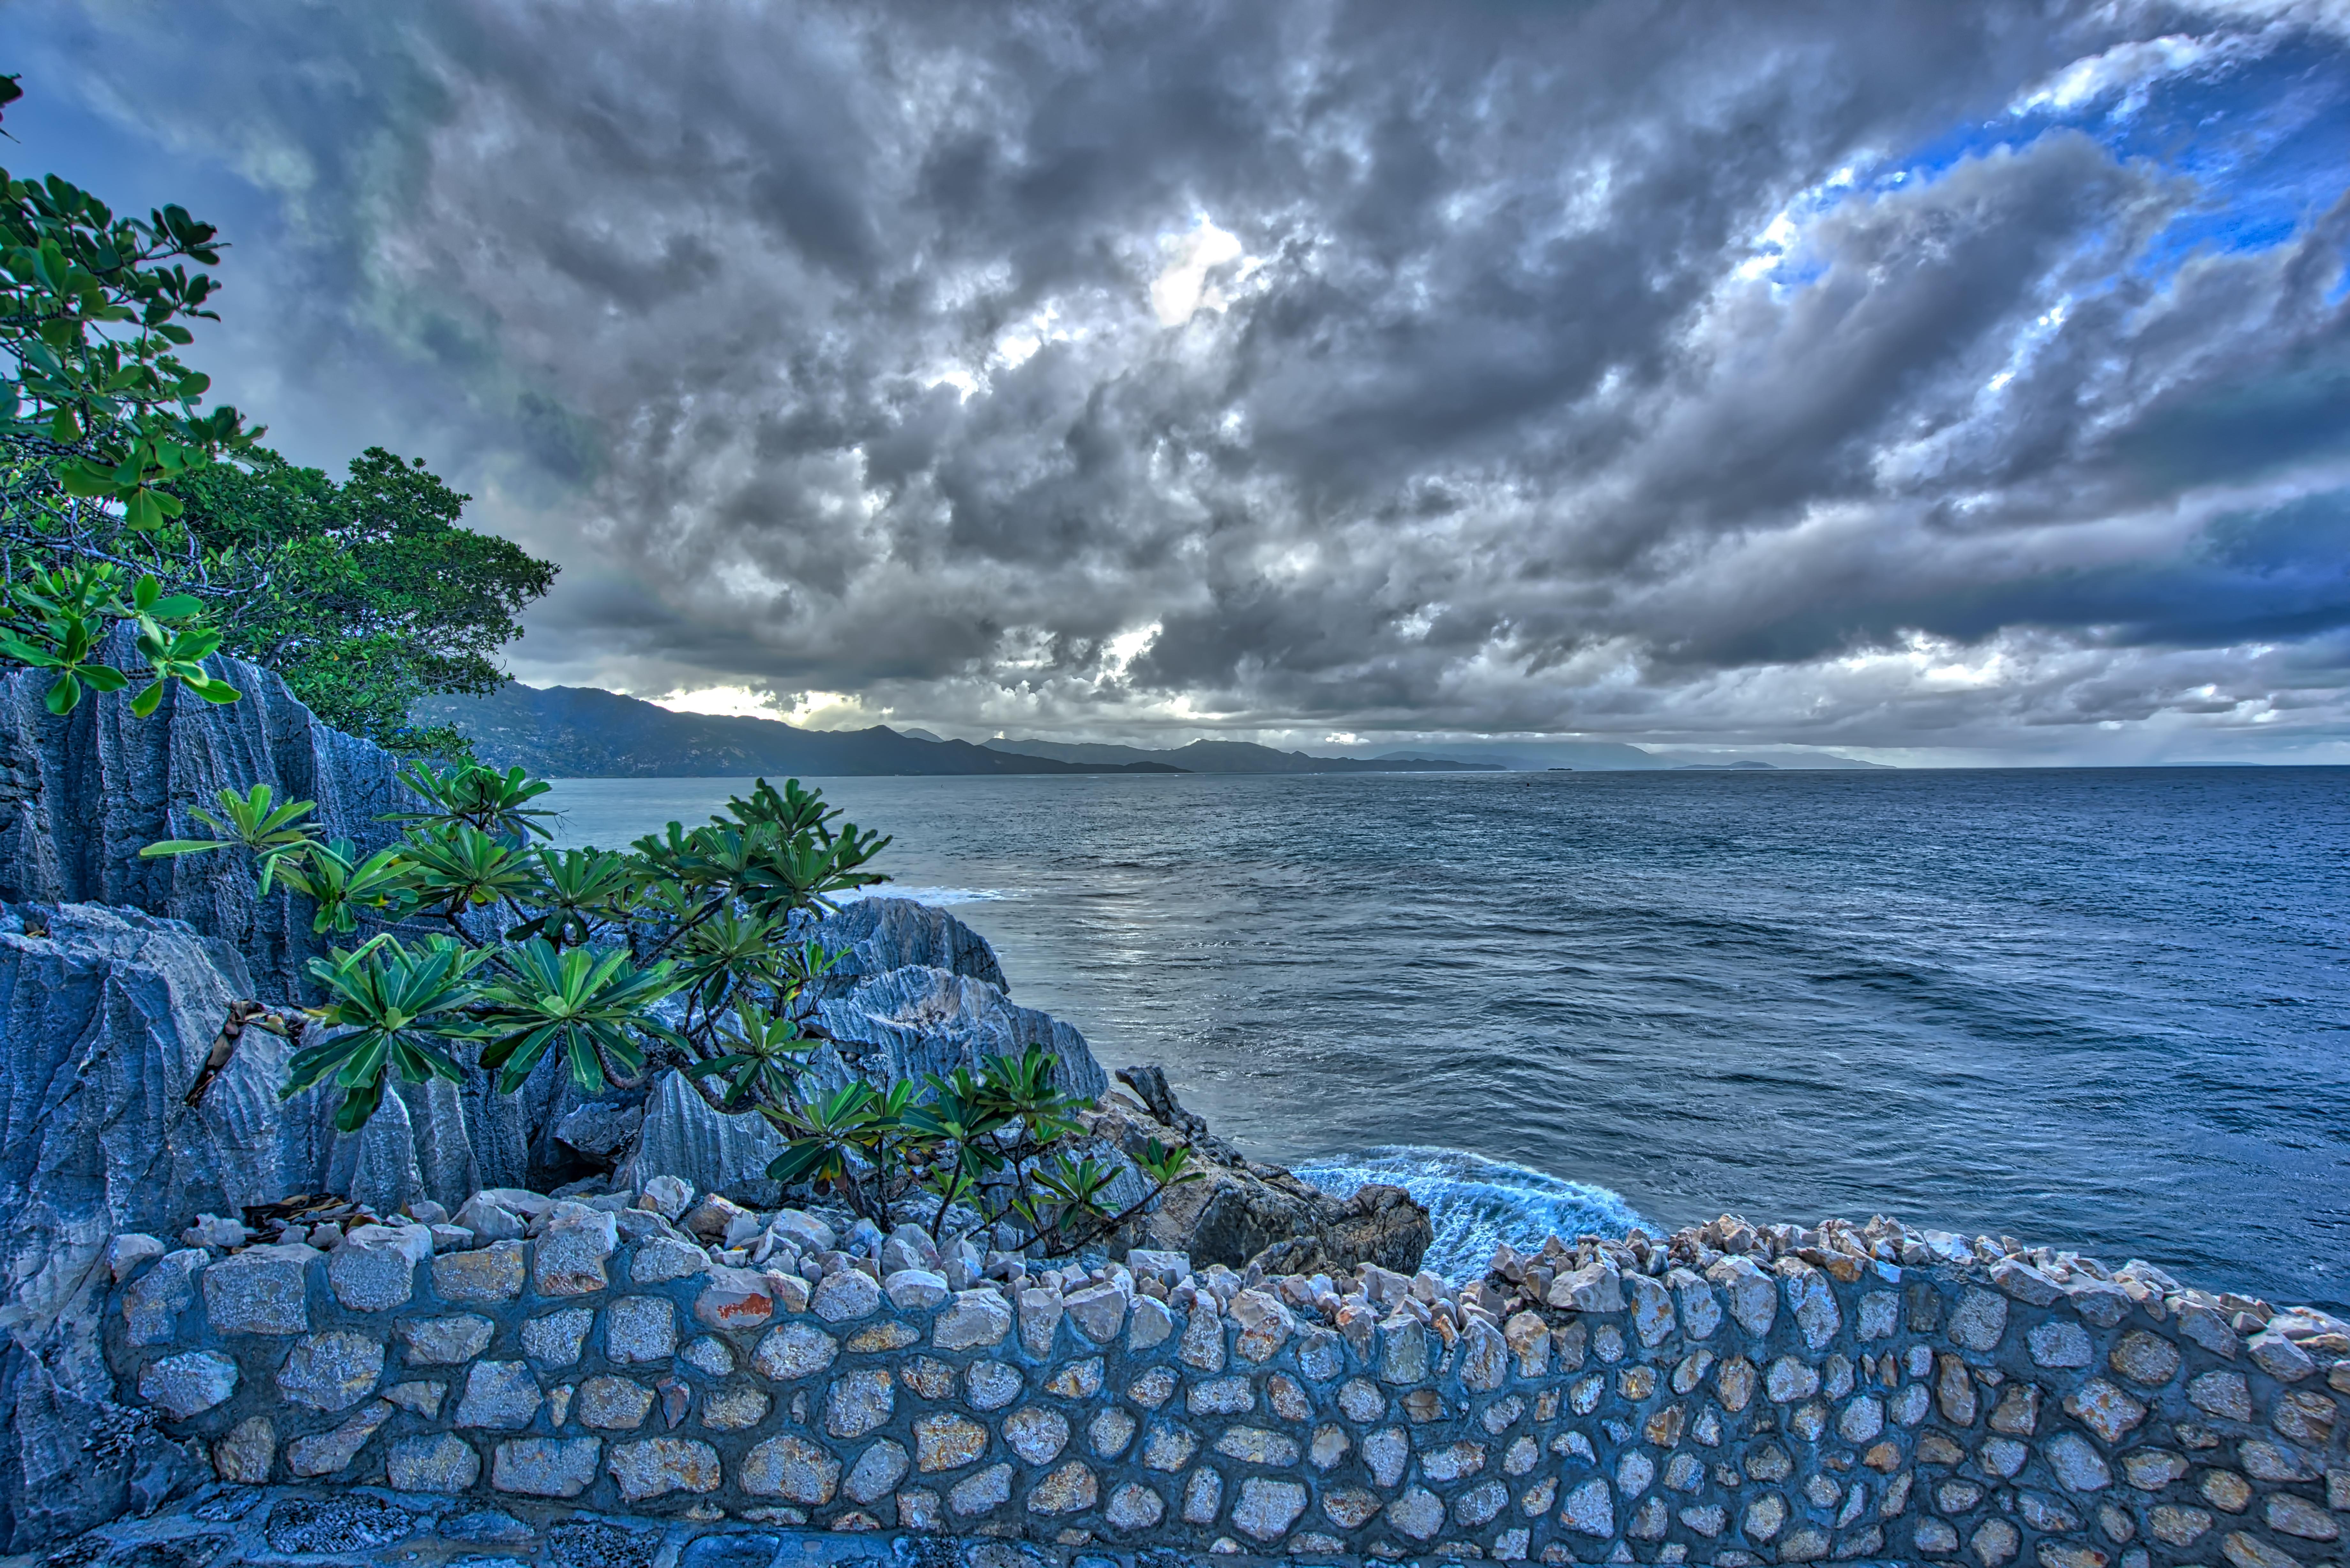 Stone Path Along Sea, Haiti, Clouds, Haiti, HDR, Outdoor, HQ Photo